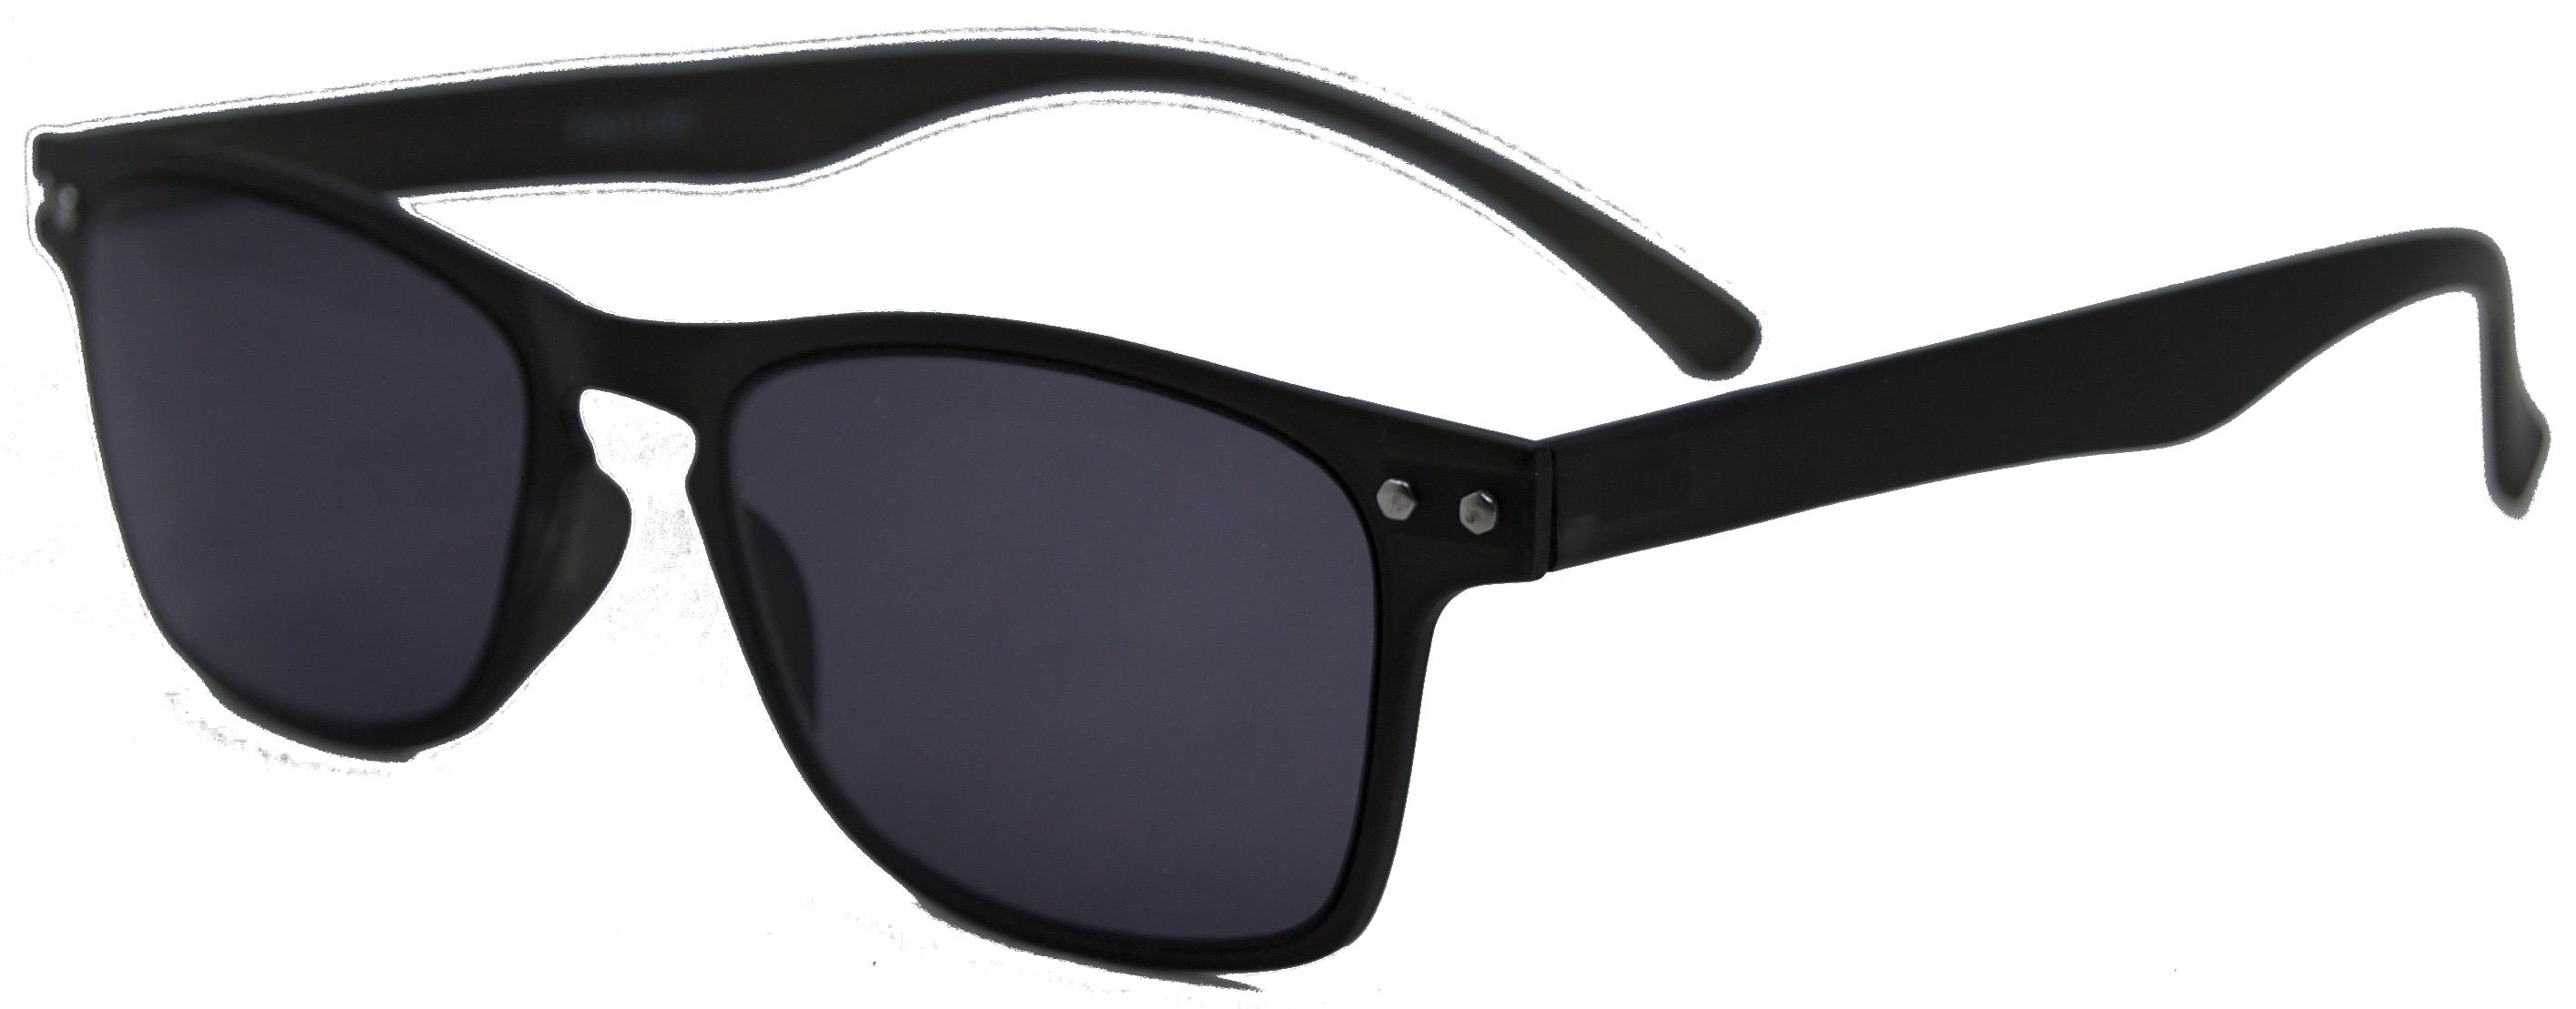 In Style Eyes FlexiSun, Reading Sunglasses Super Comfortable ...